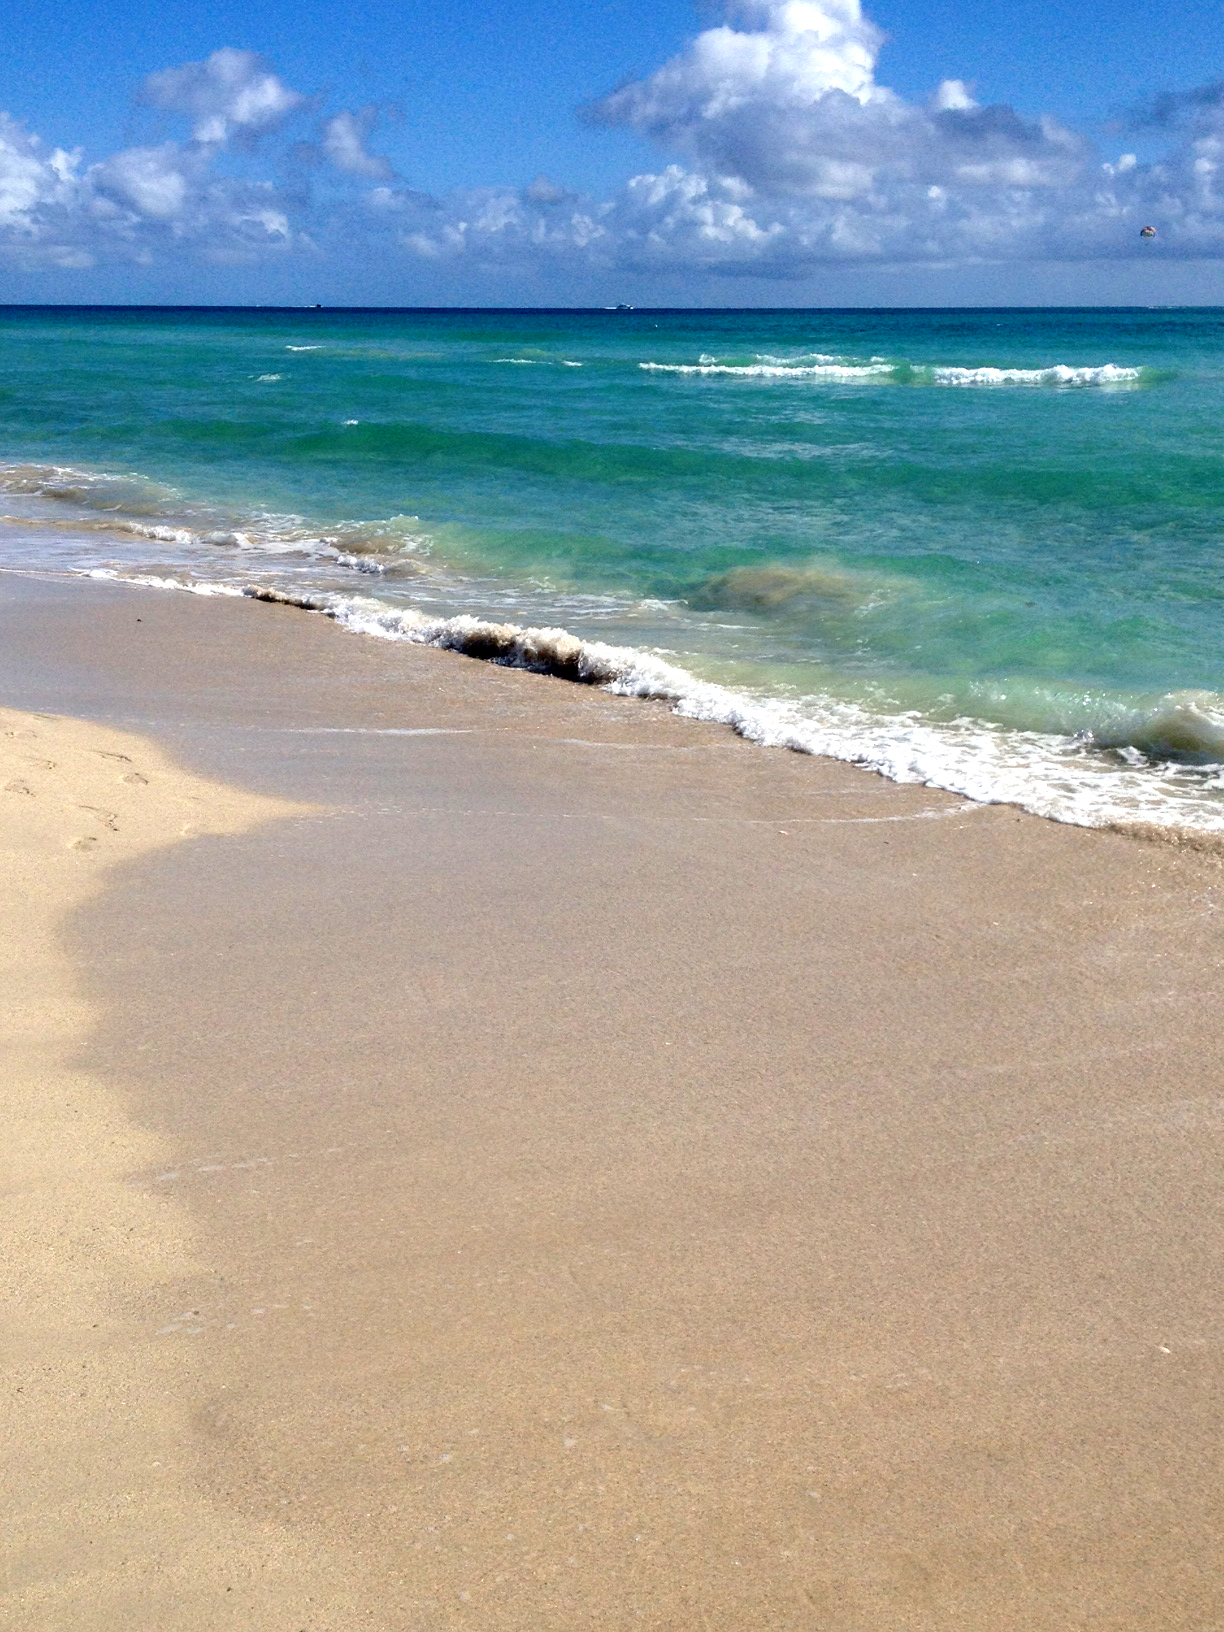 Miami Beach, people-less